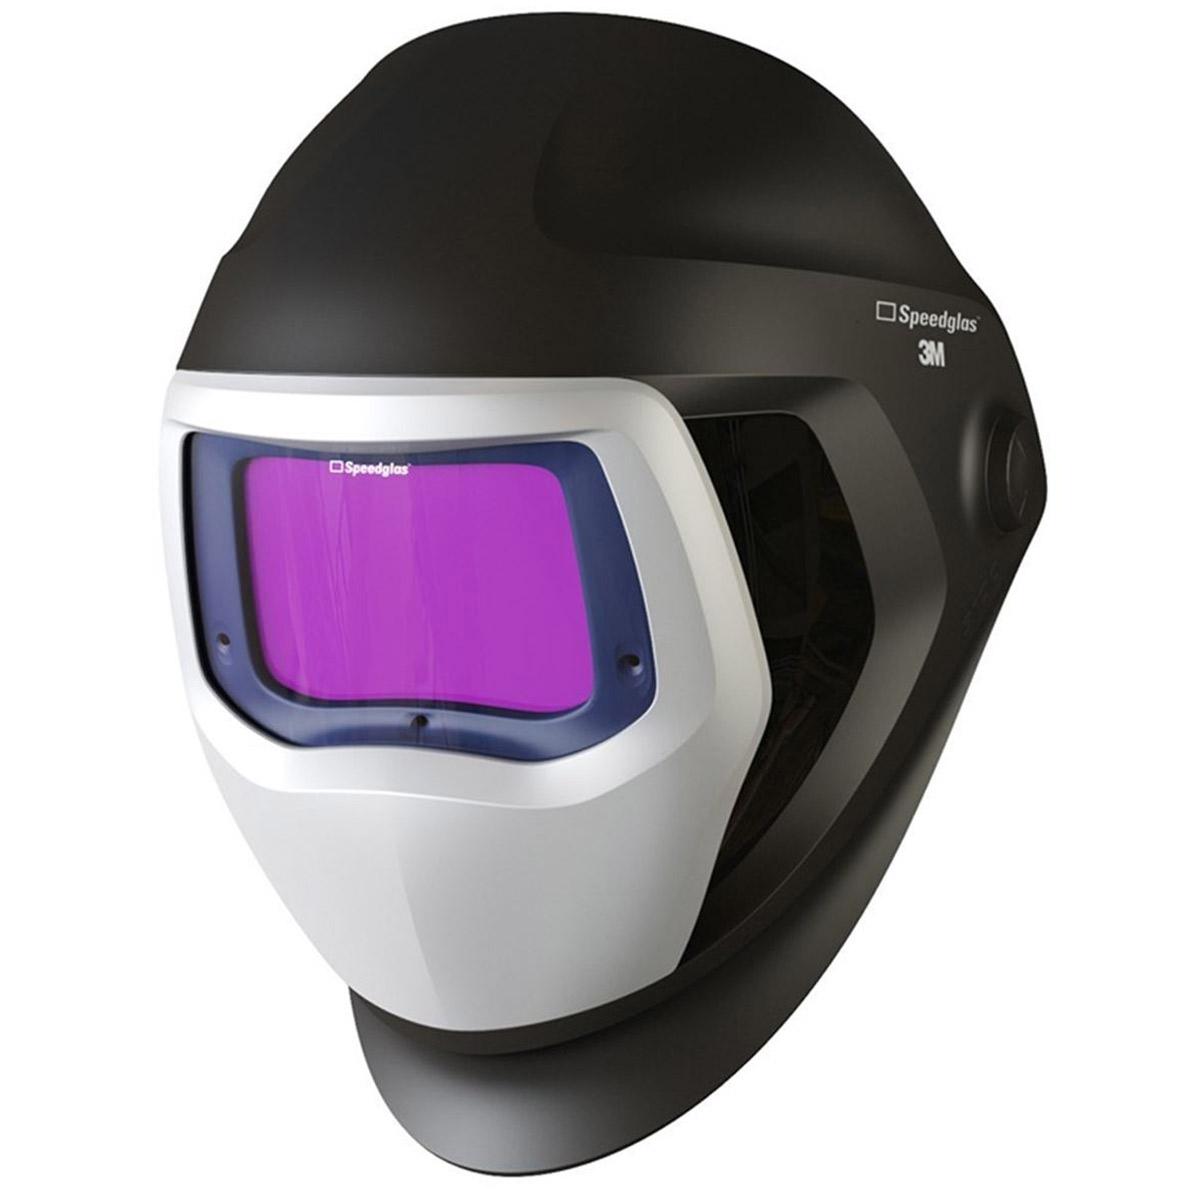 3M(スリーエム) スピードグラス 自動遮光溶接面 エクストラワイドビュータイプ 9100XX [501825]